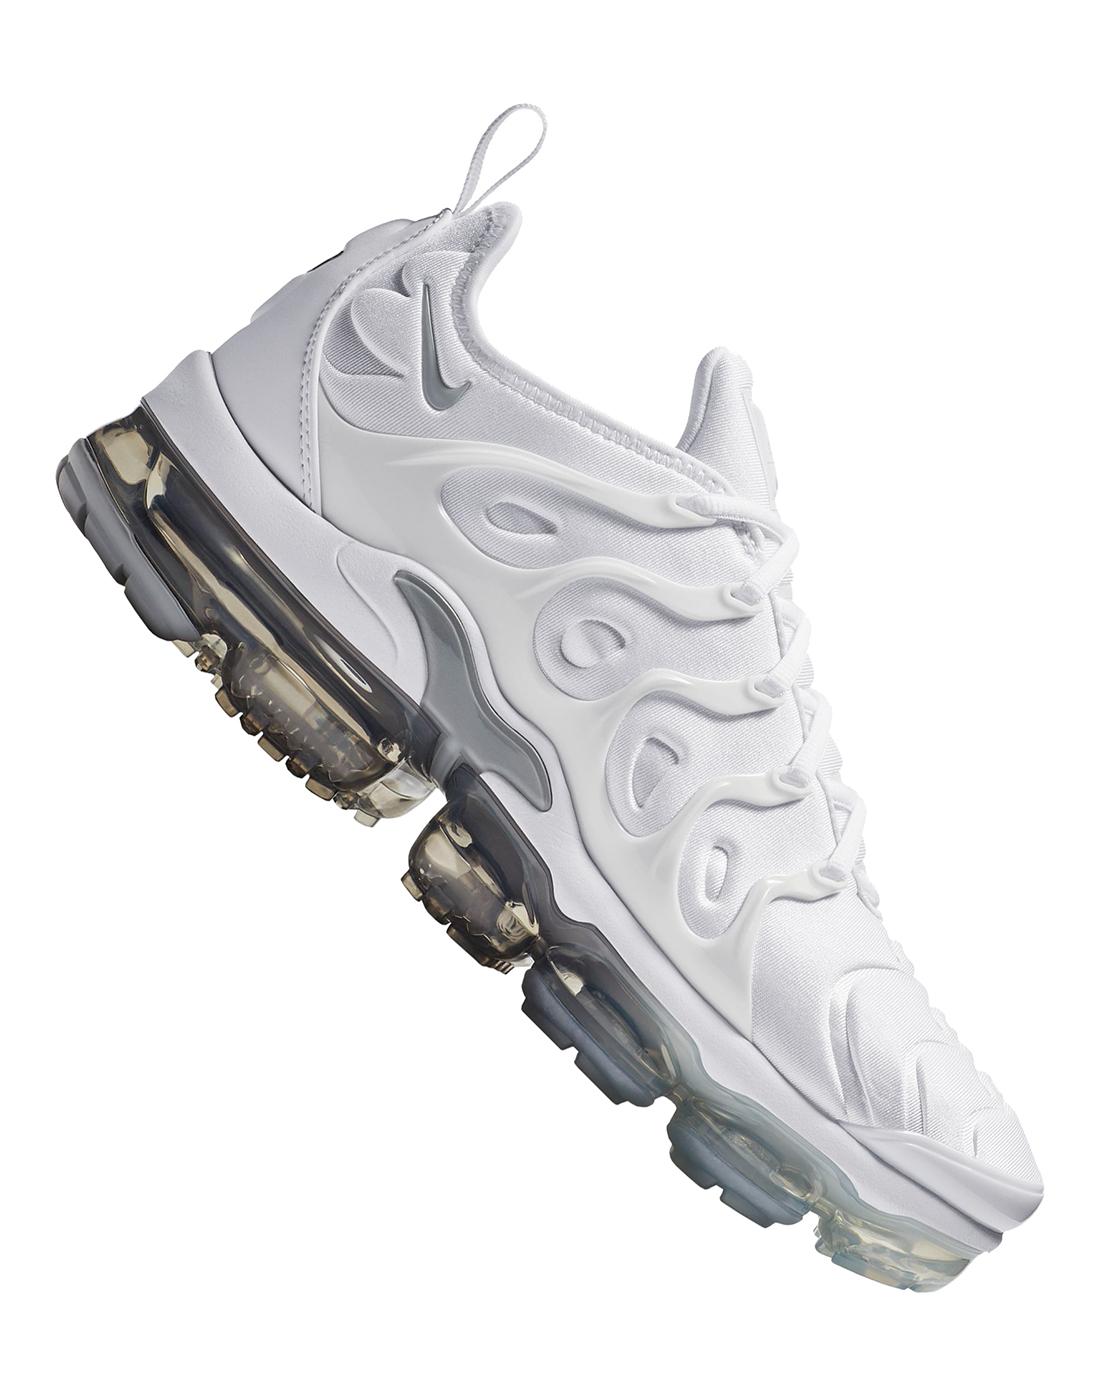 Men's White Nike Air VaporMax Plus